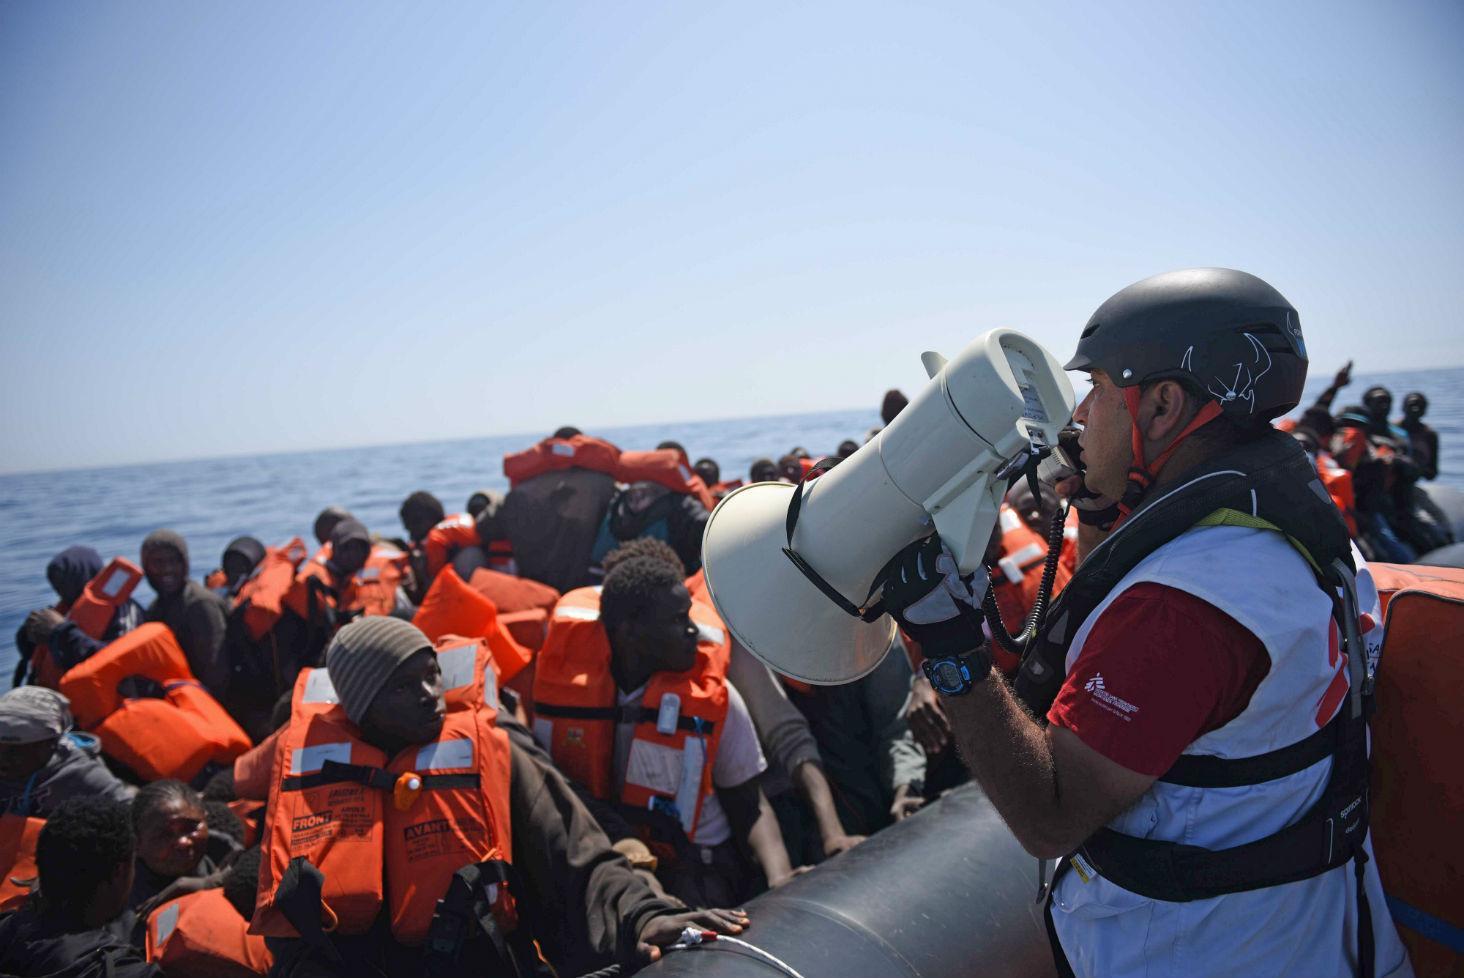 Foto: Sara Creta / MSF